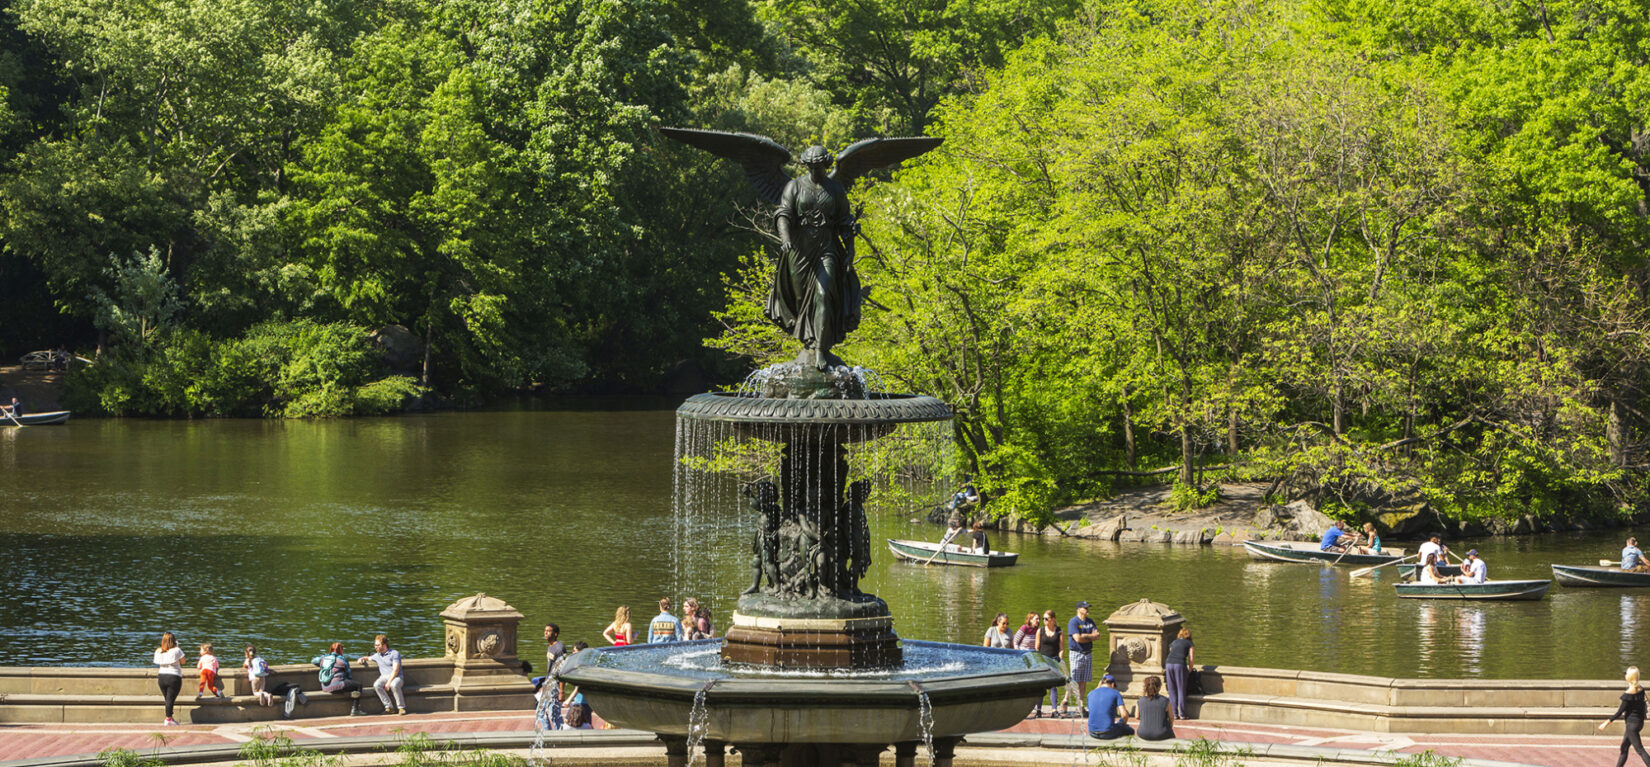 Bethesda Terrace and Fountain